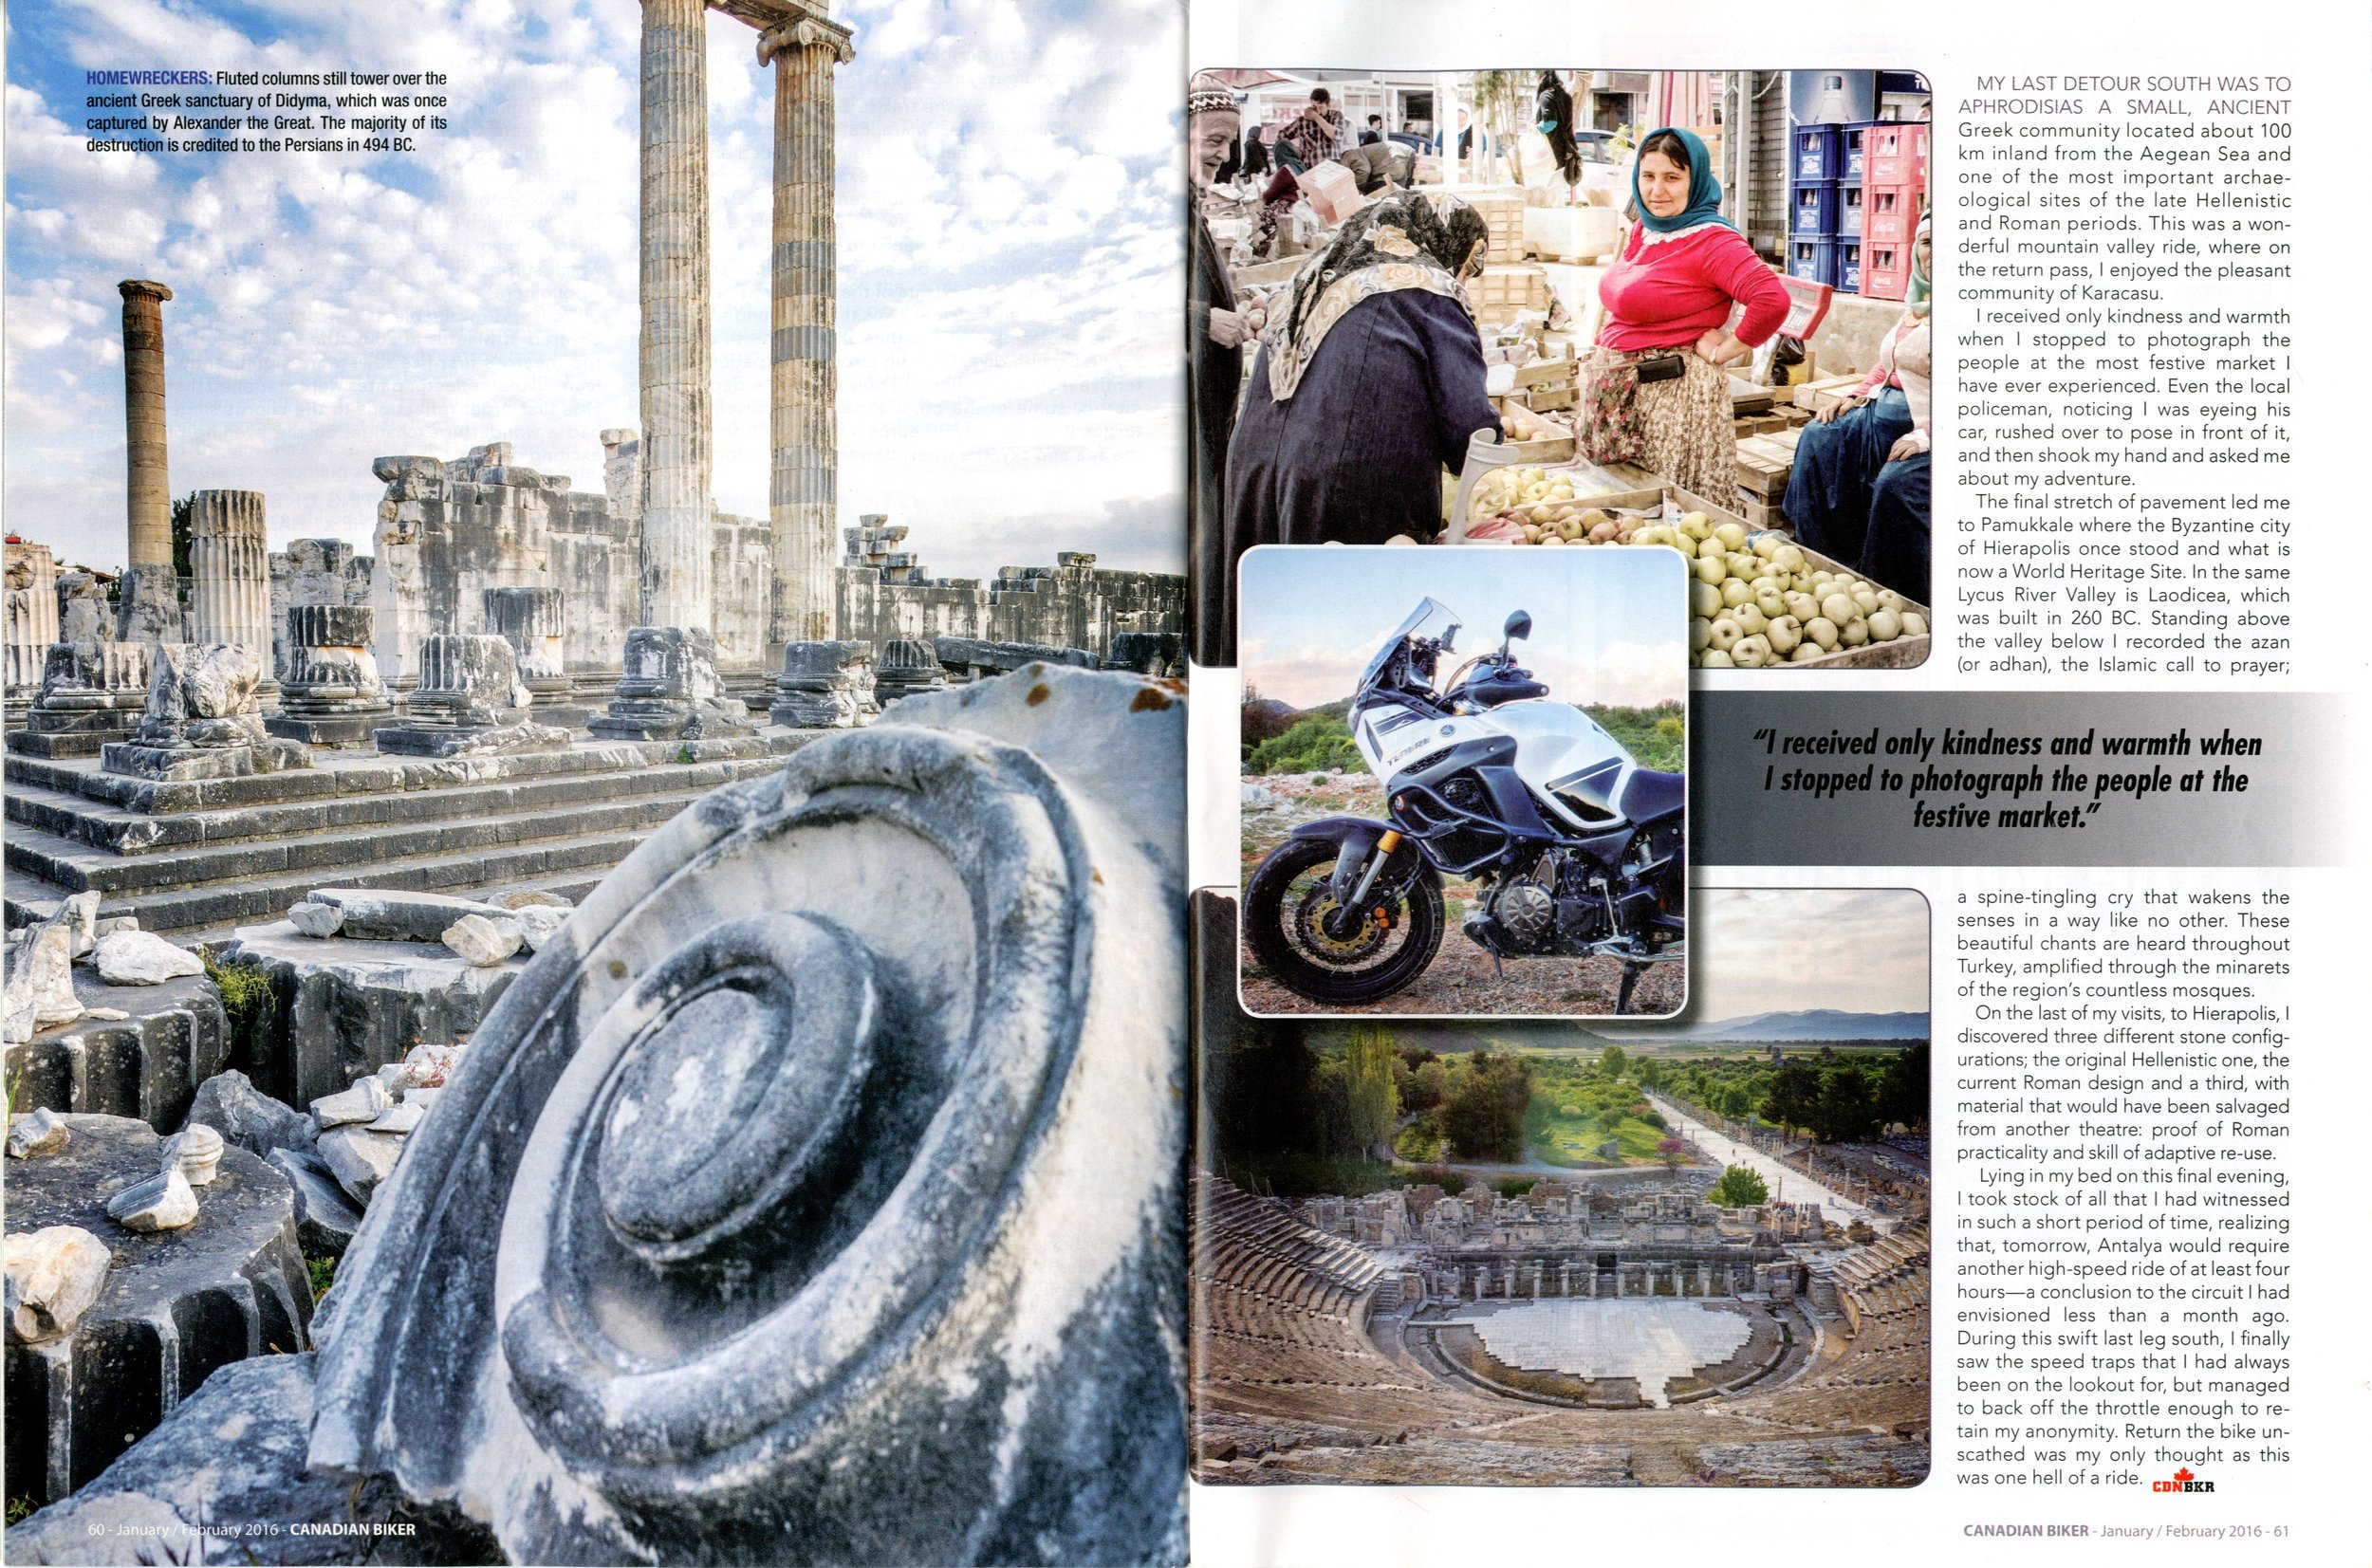 Stone Temple Rider006.jpg